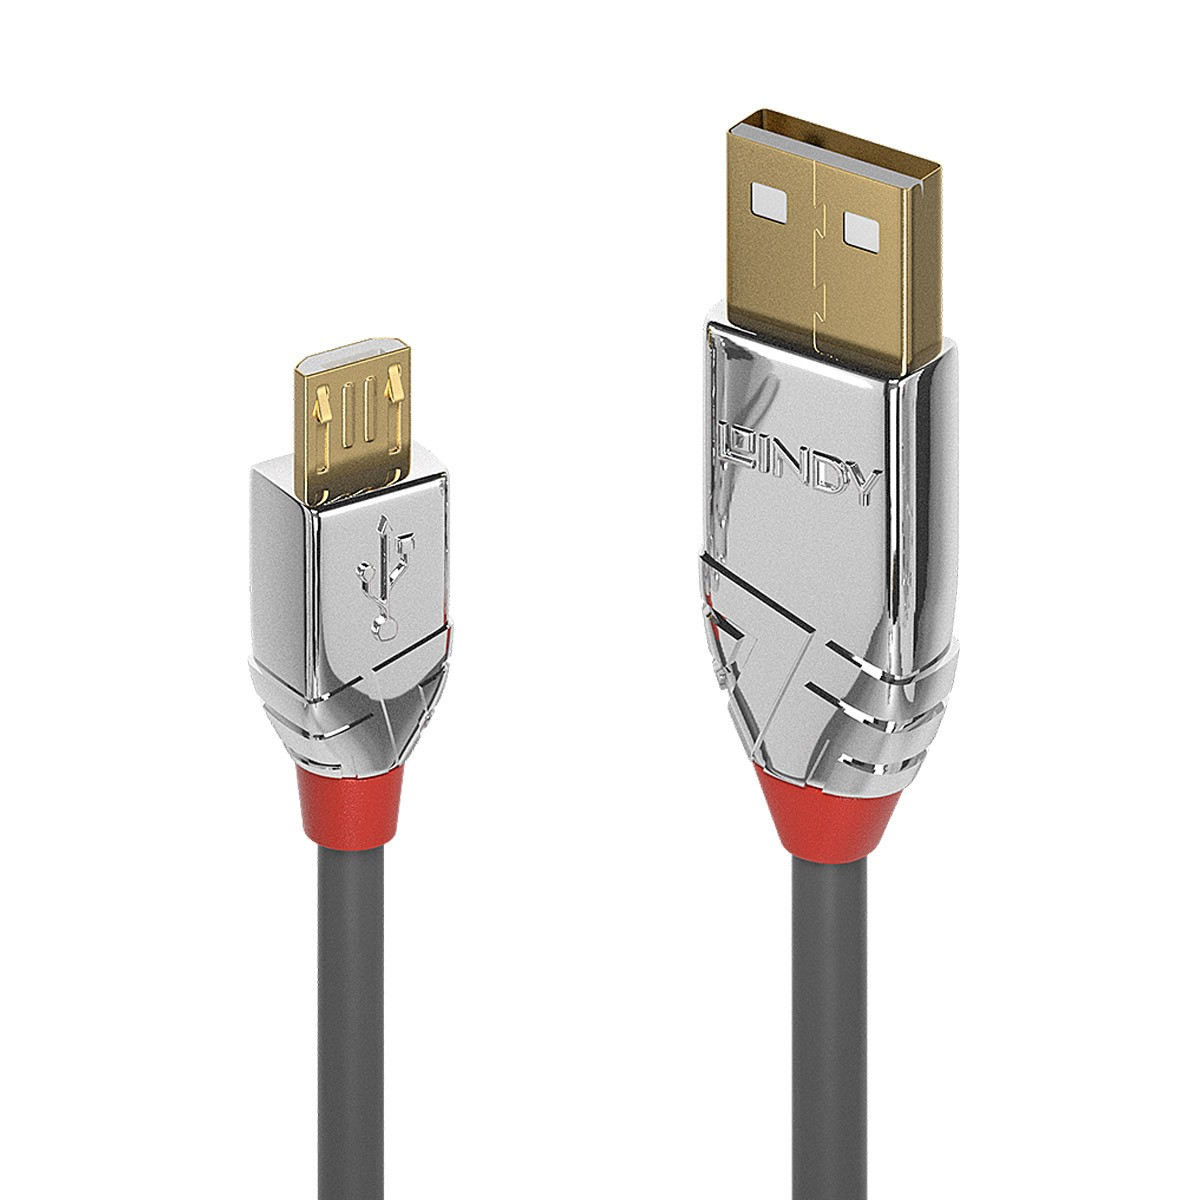 LINDY CROMO LINE Câble USB-A Mâle vers Micro USB-B Mâle 2.0 Plaqué Or 1m